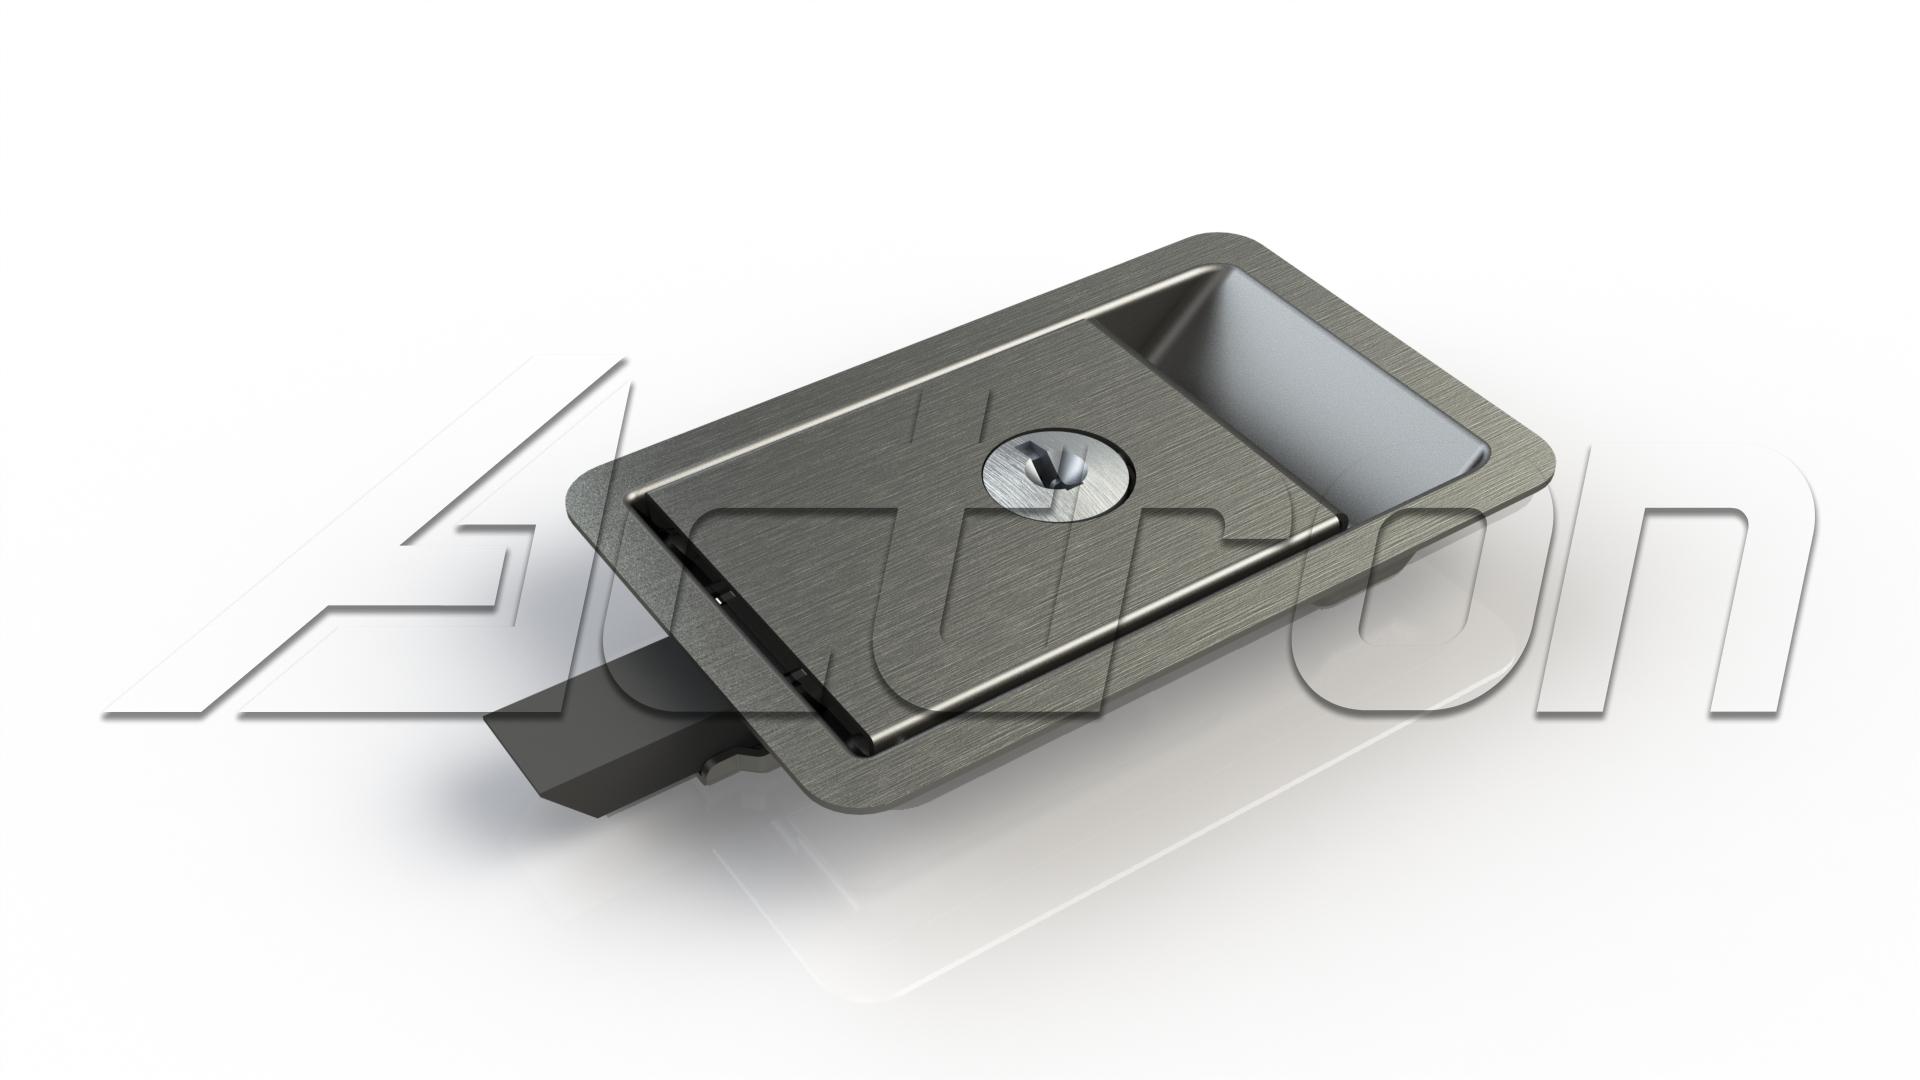 latchlock-assy-8211-paddle-4118-a20035.jpg